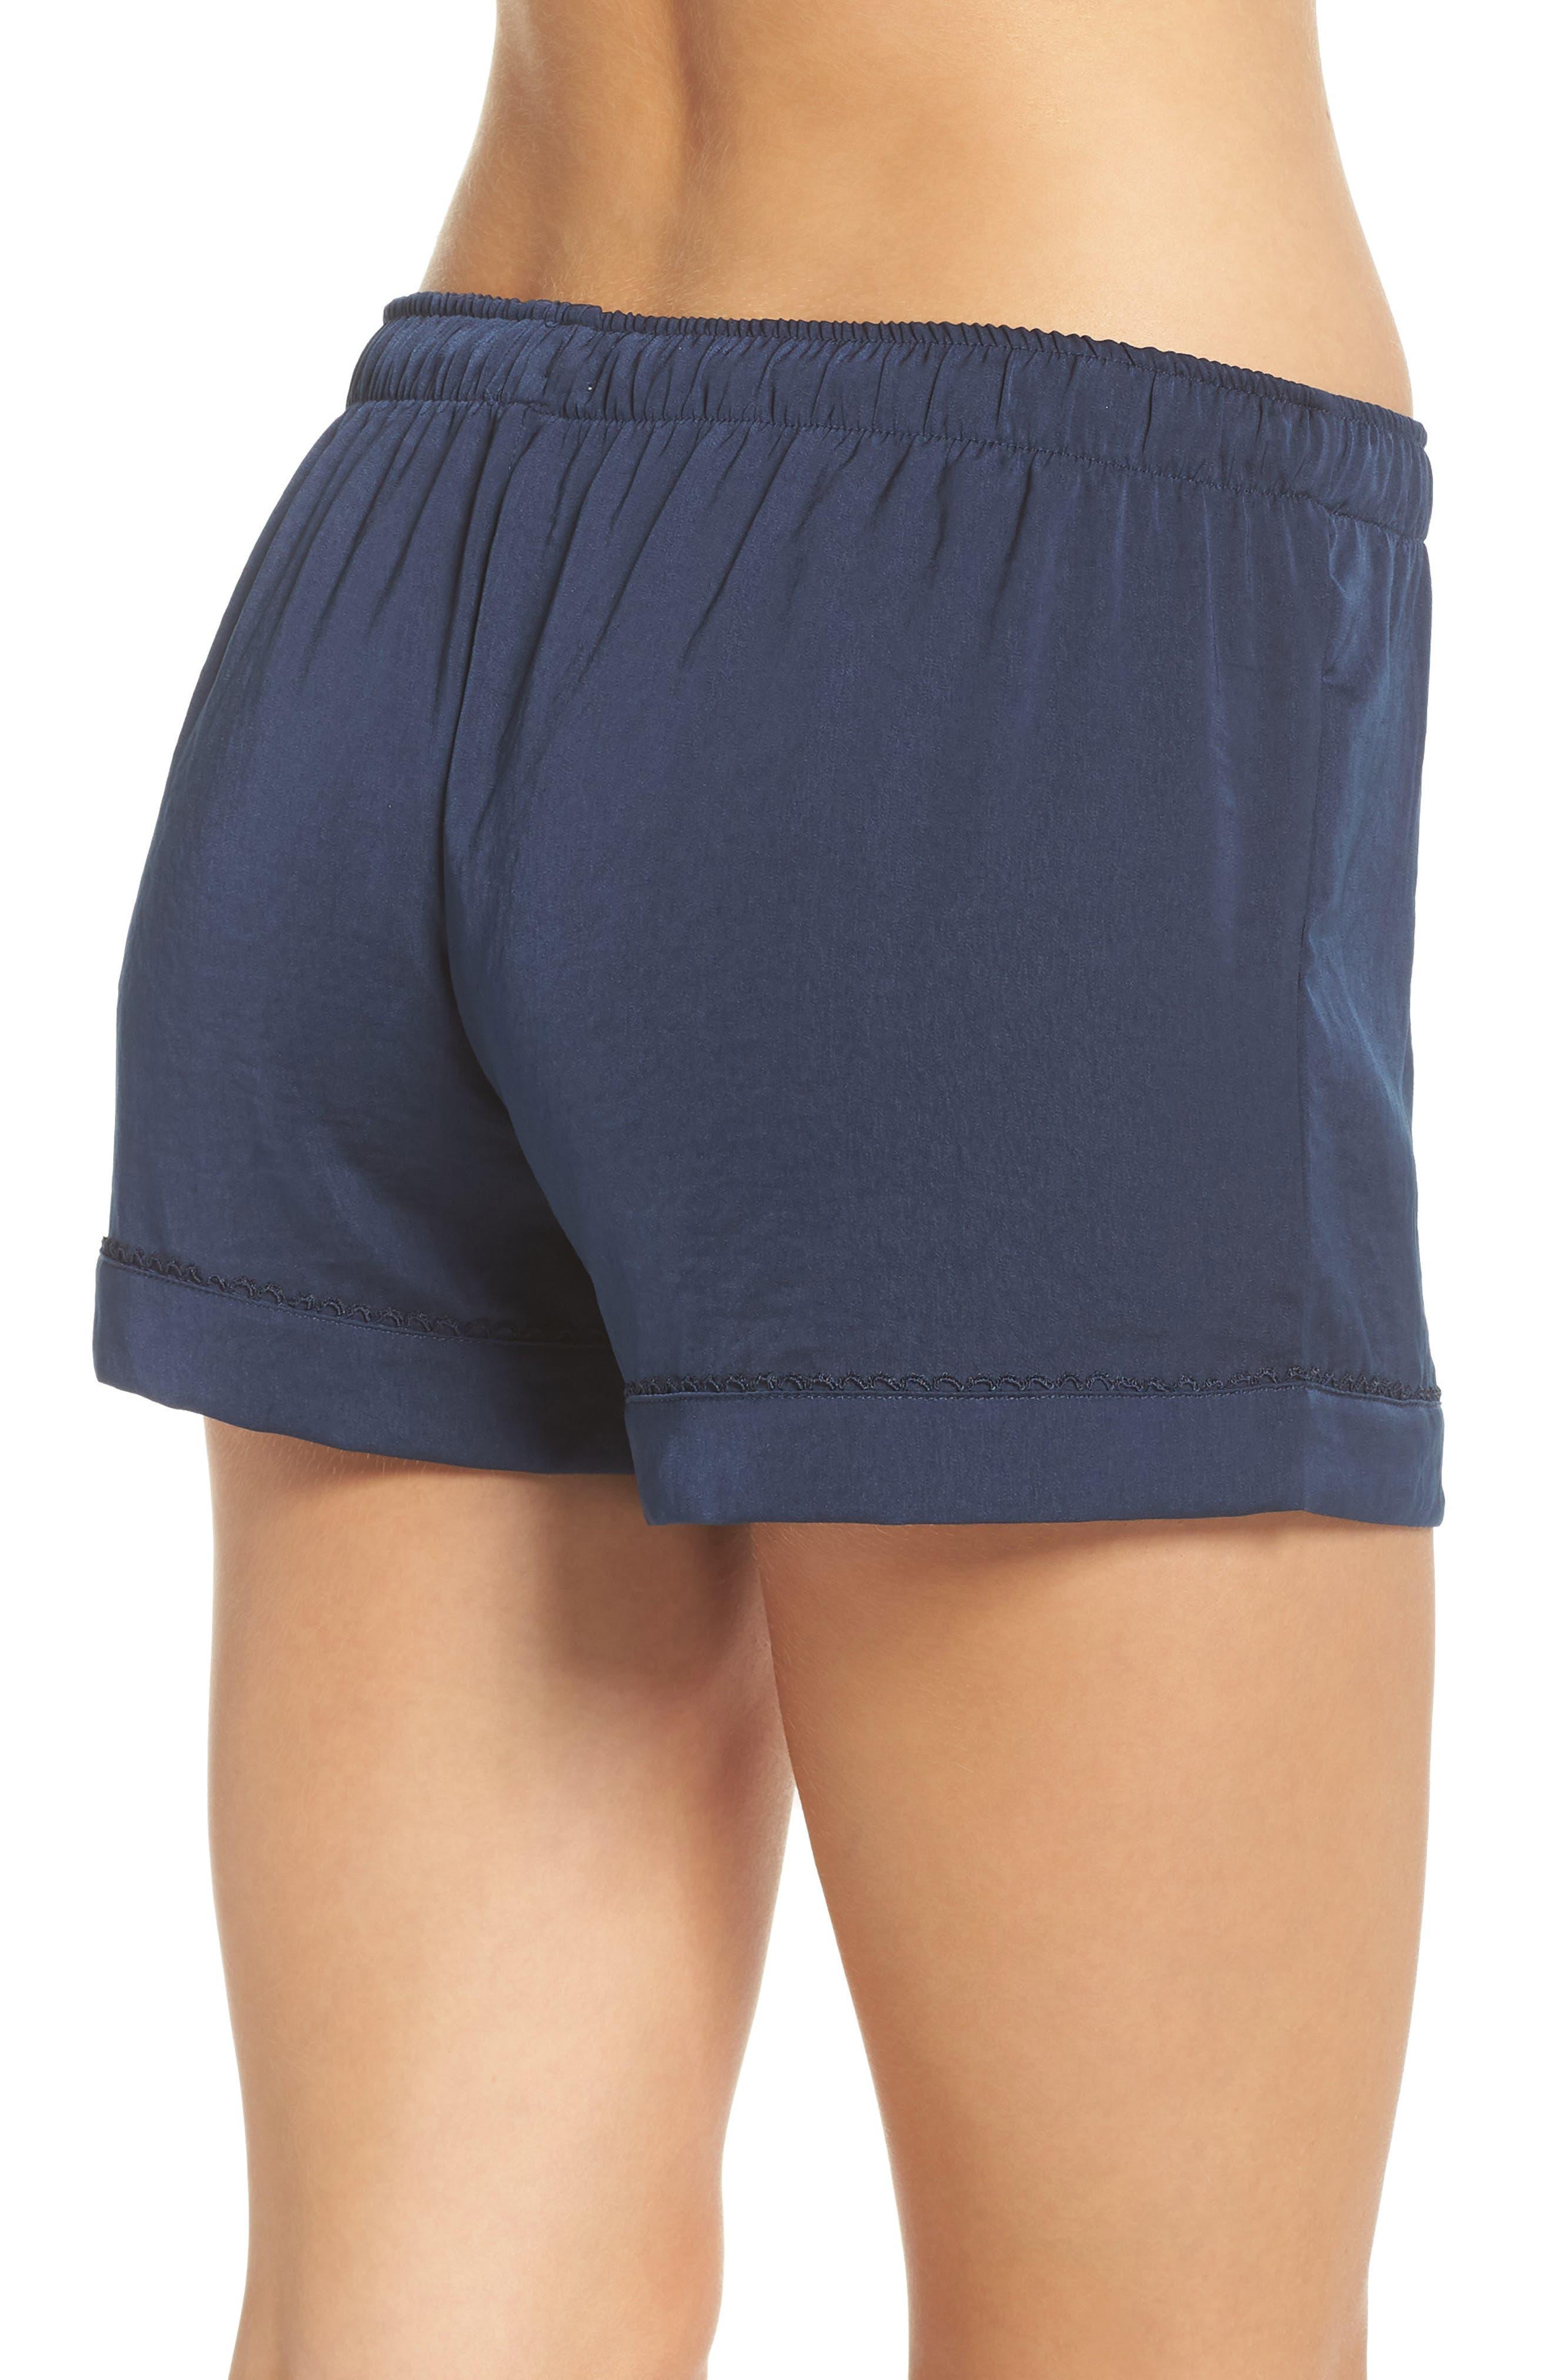 Pajama Shorts,                             Alternate thumbnail 2, color,                             400